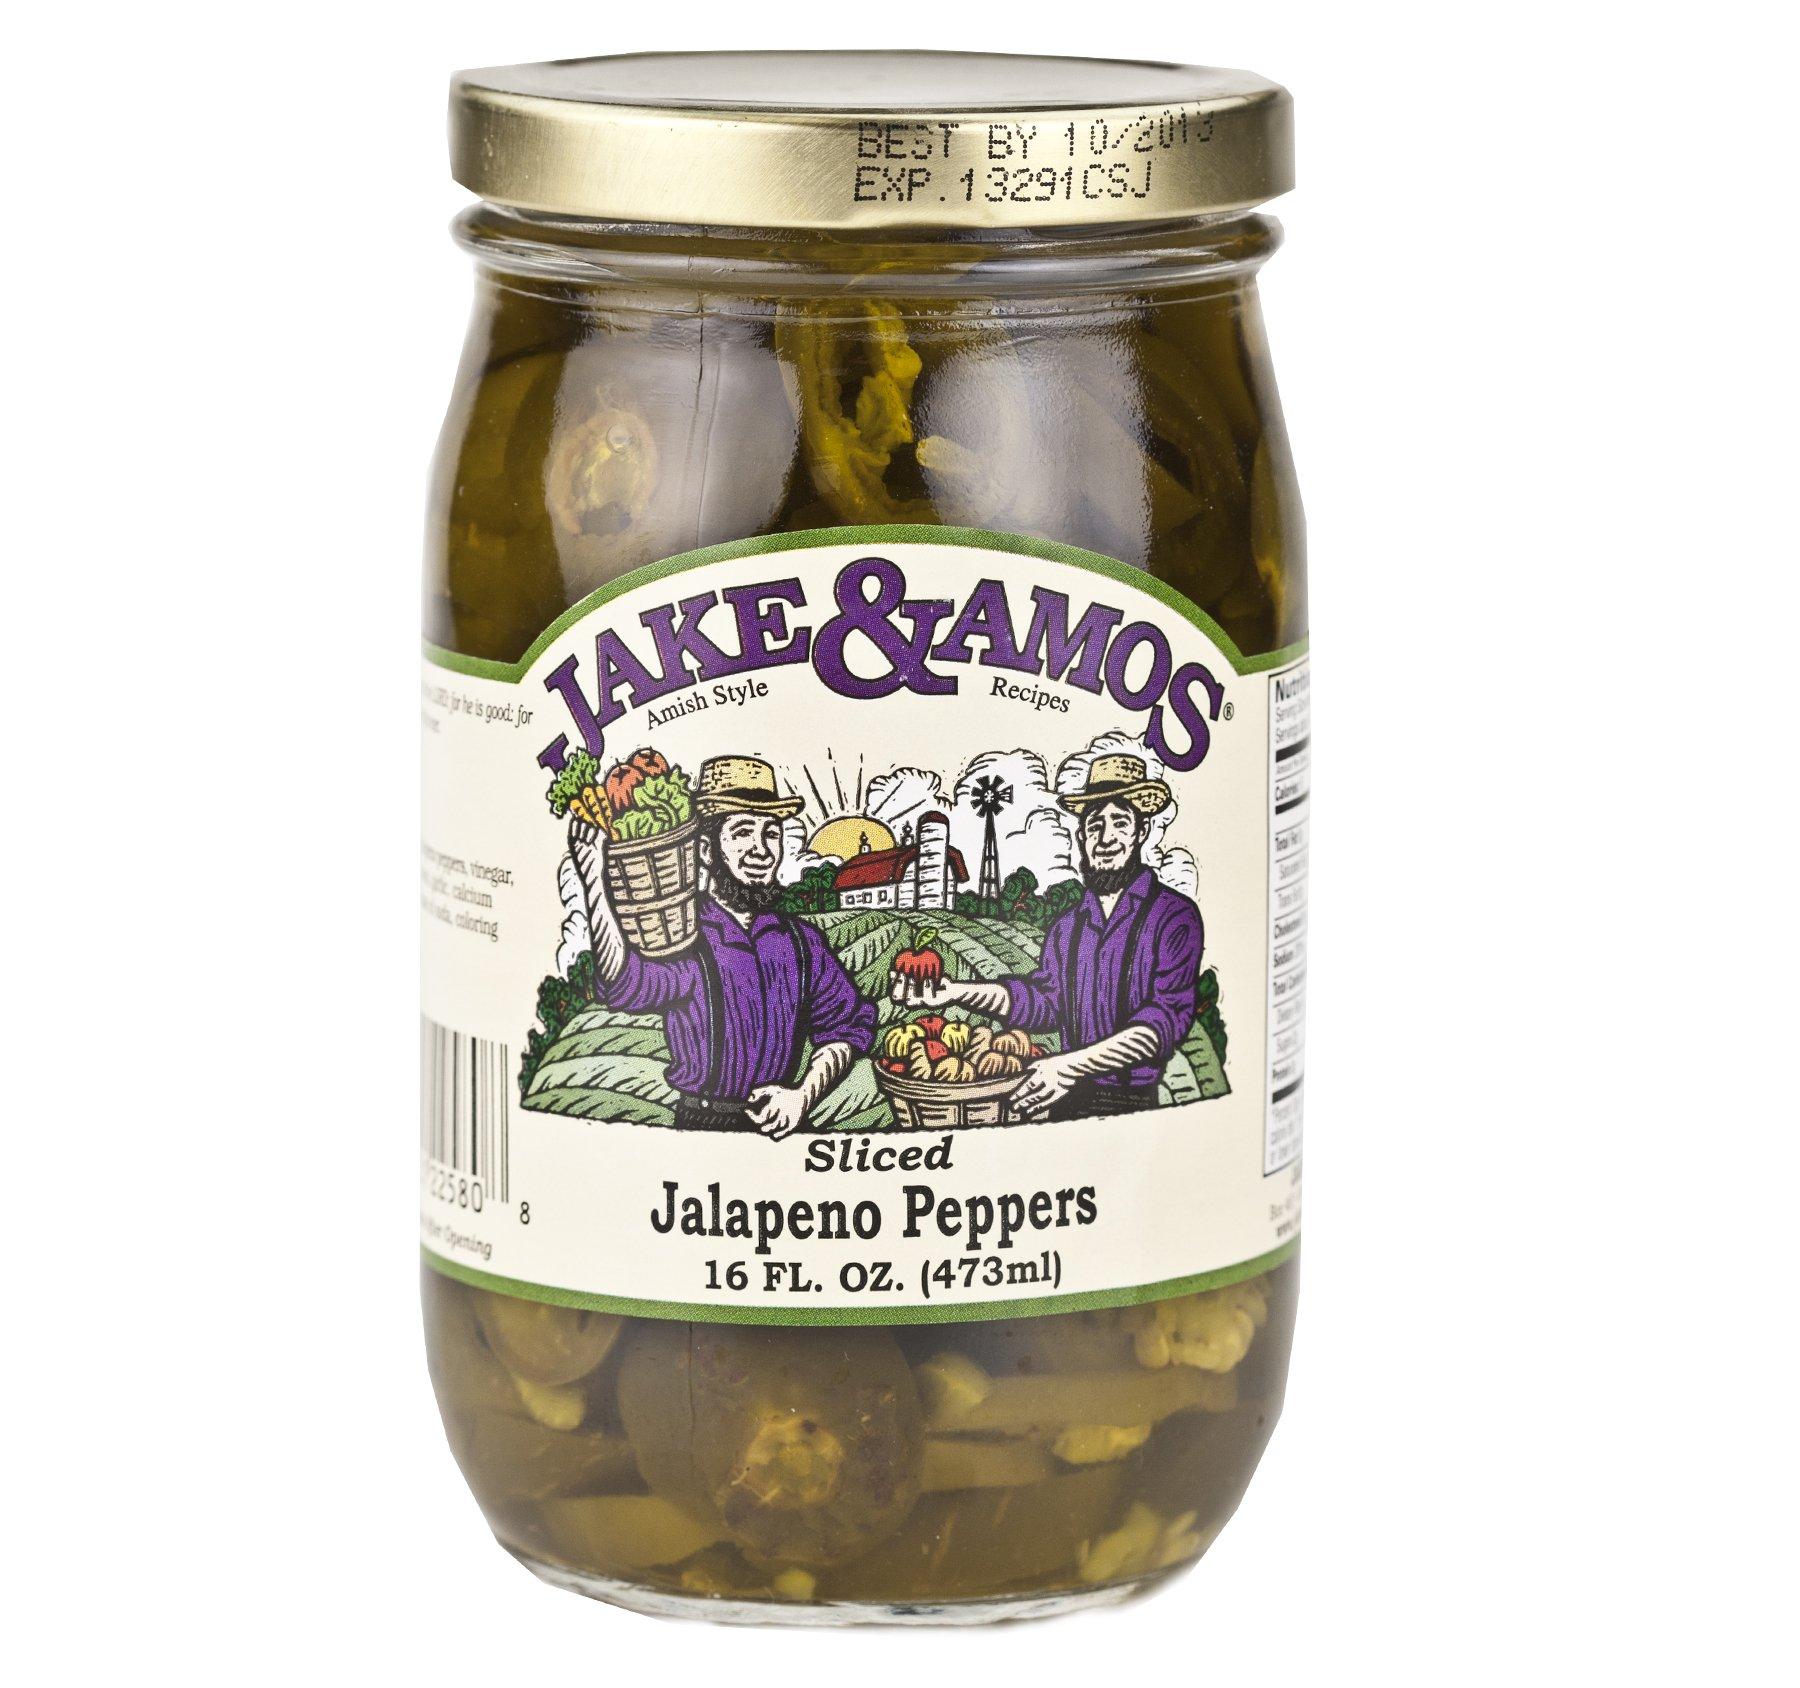 Jake & Amos Sliced Jalapeno Peppers 16 oz. (3 Jars)